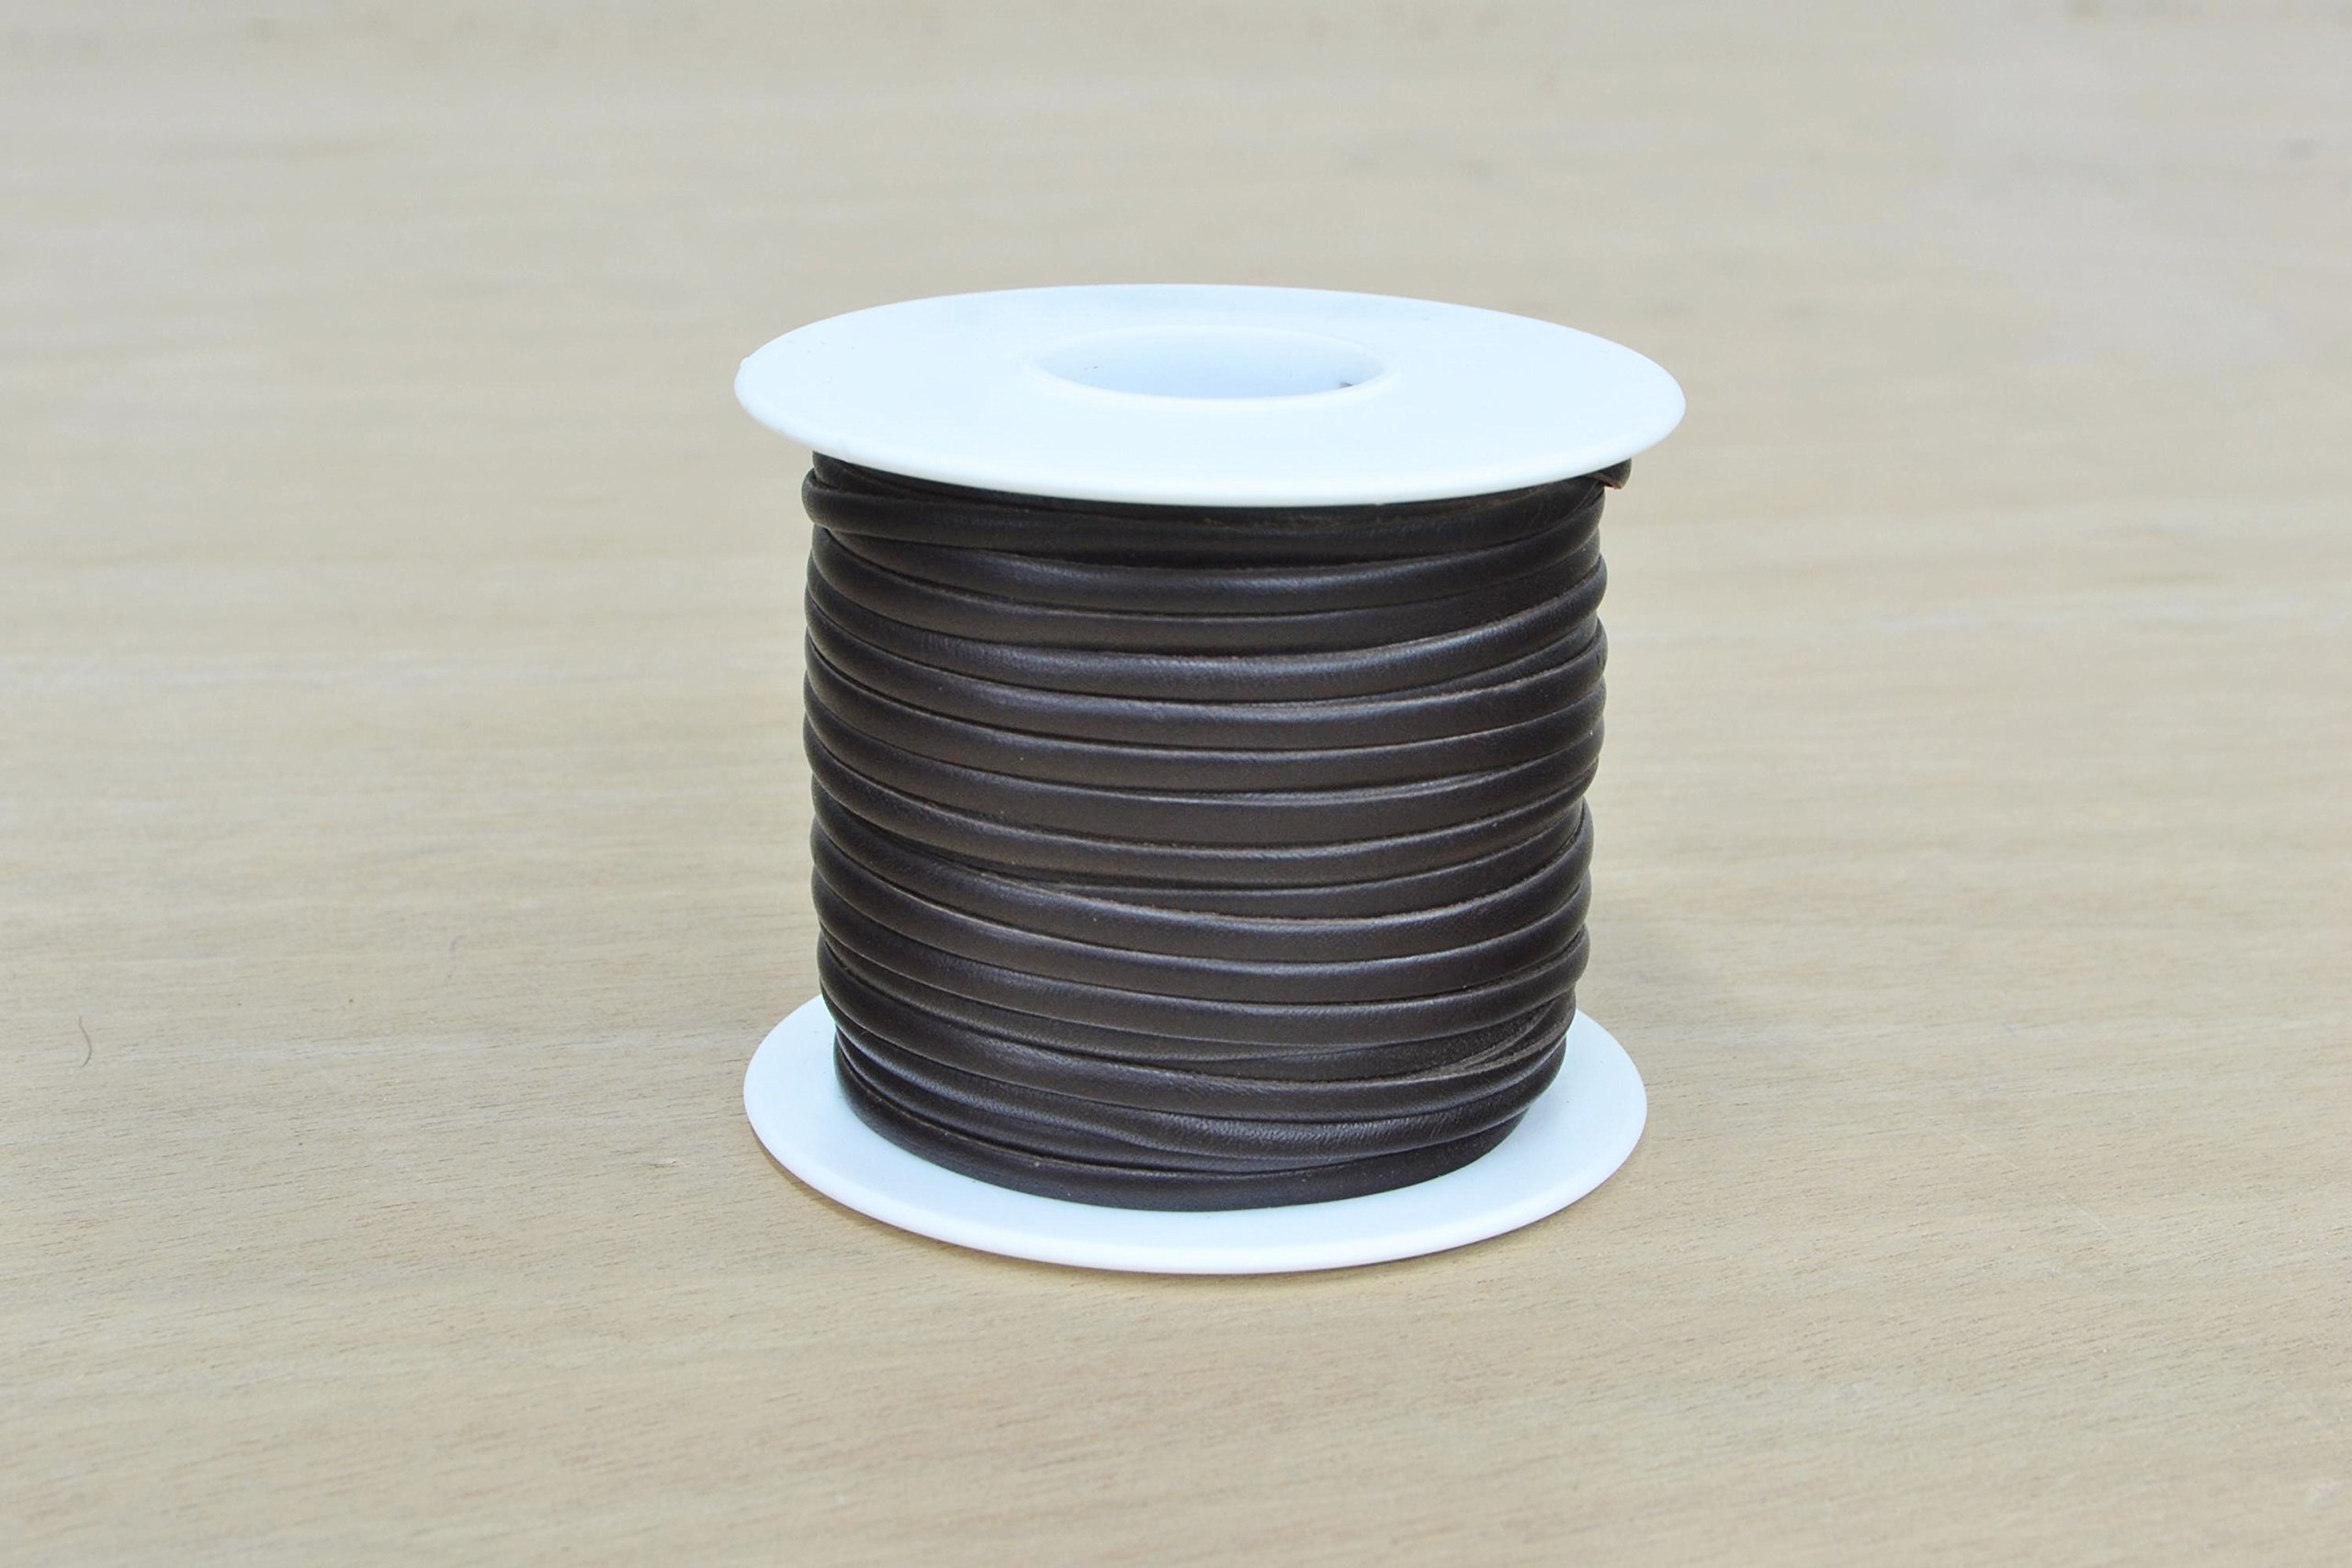 Calfskin Leather Lacing Spool 1/8'' x 50 Yards Dark Brown Flat Satin Lace